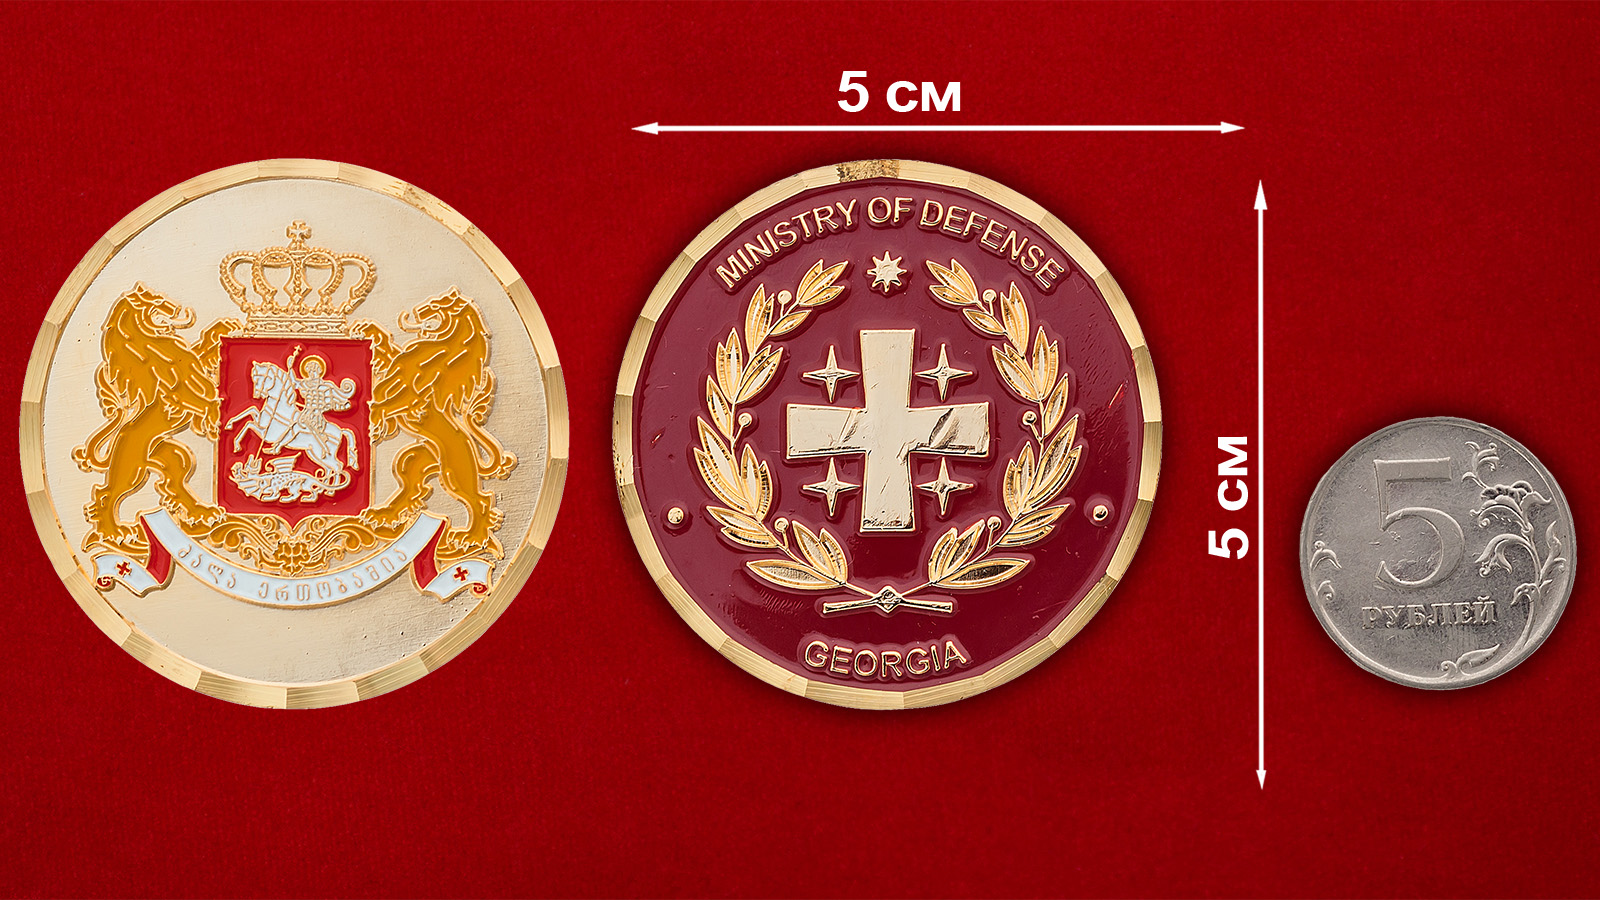 Челлендж коин Министерства обороны Грузии